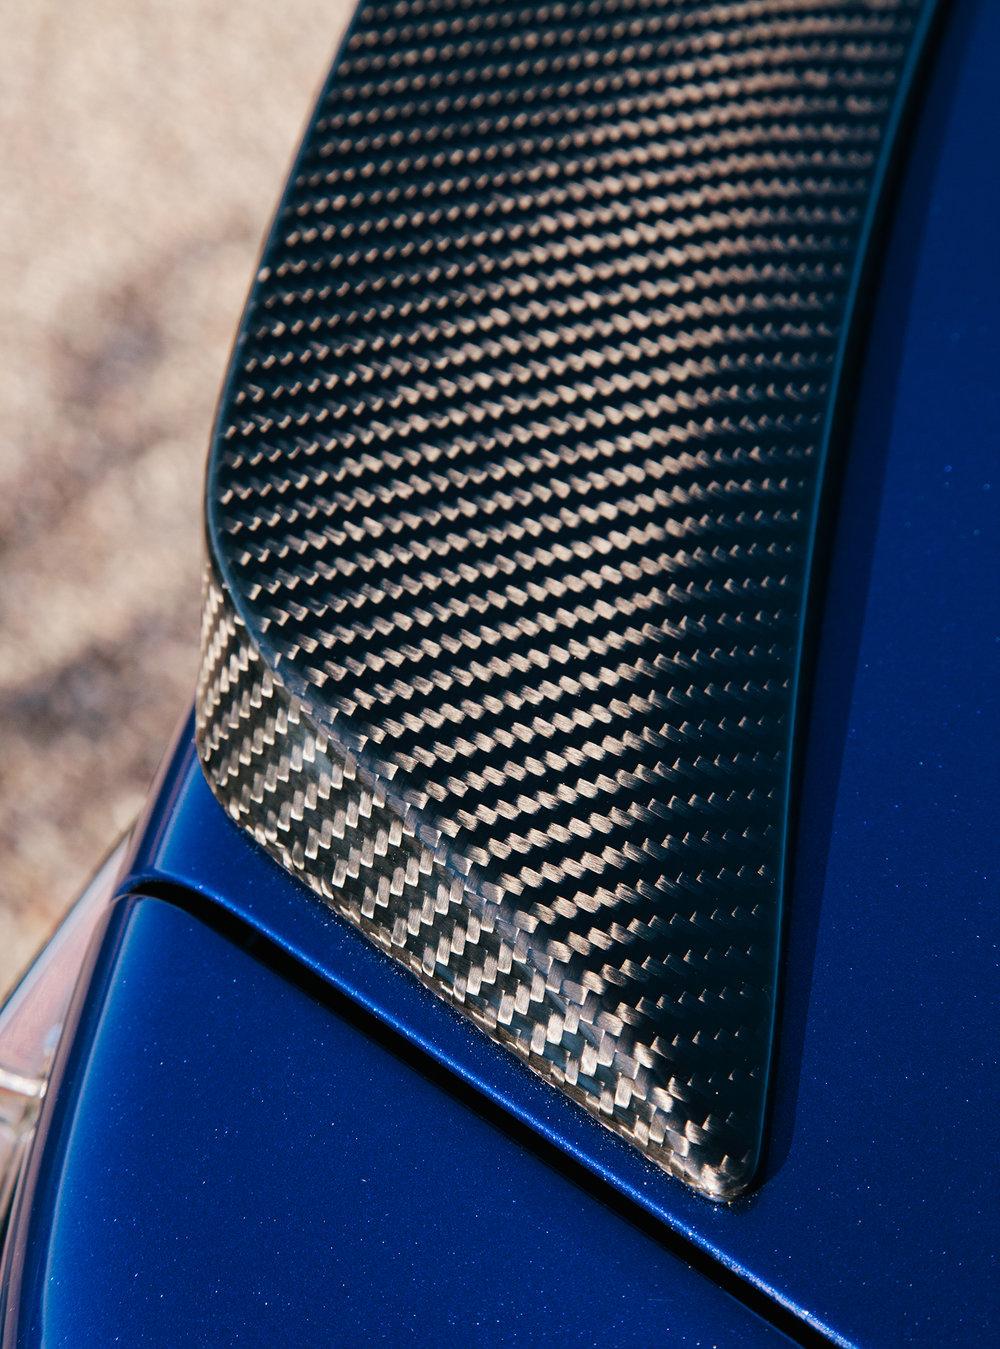 Lexus_Reveal_Details_CarbonFiber_033.jpg